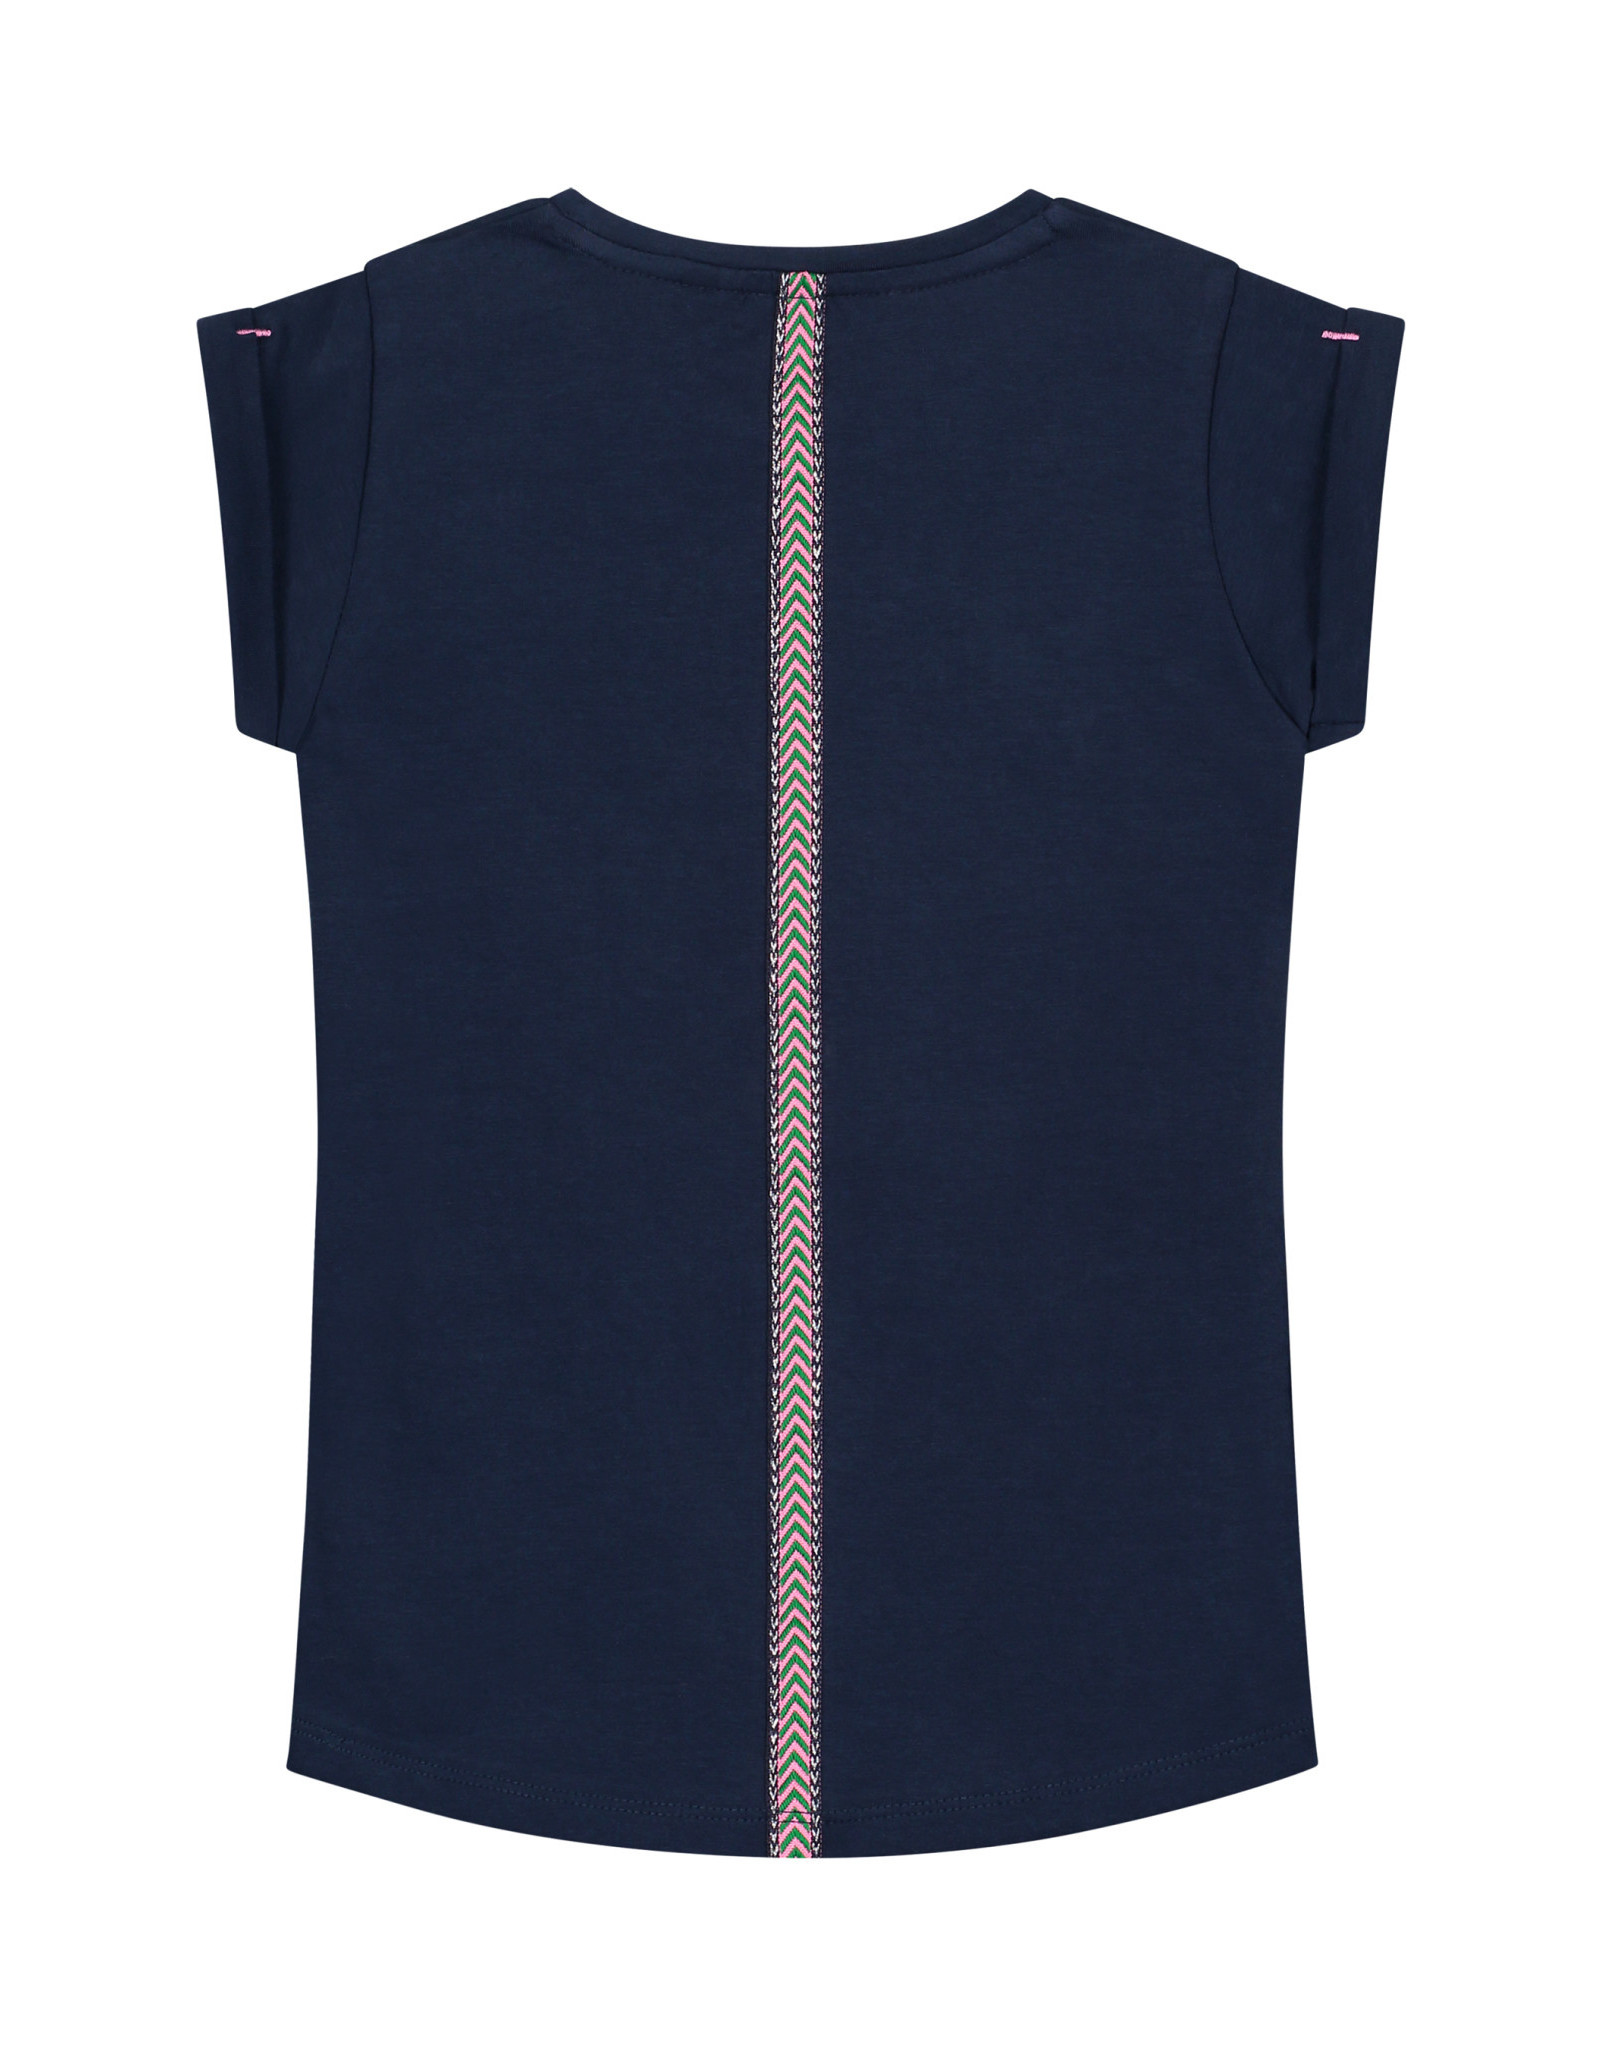 Quapi Quapi meisjes t-shirt Amalia Oxford Blue